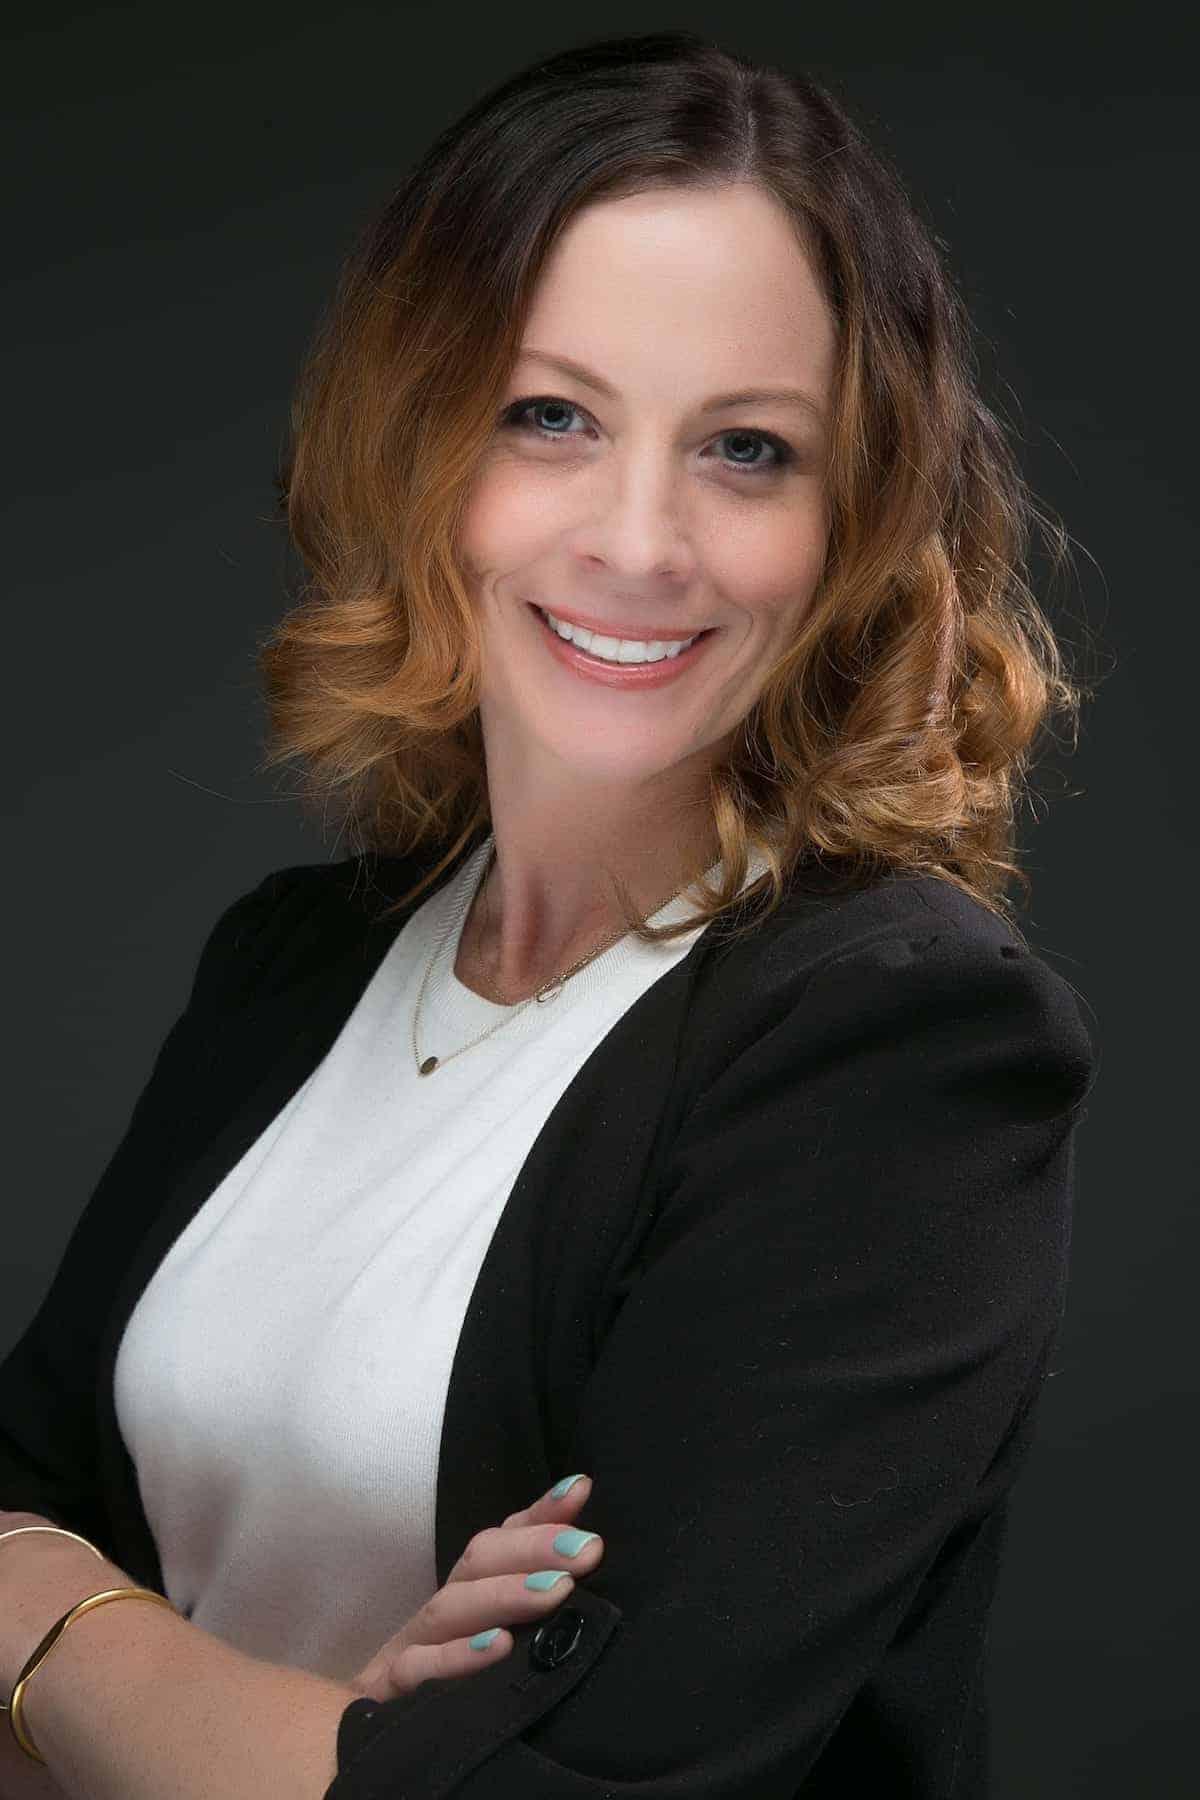 SWE Staff Spotlight: Valerie Bland